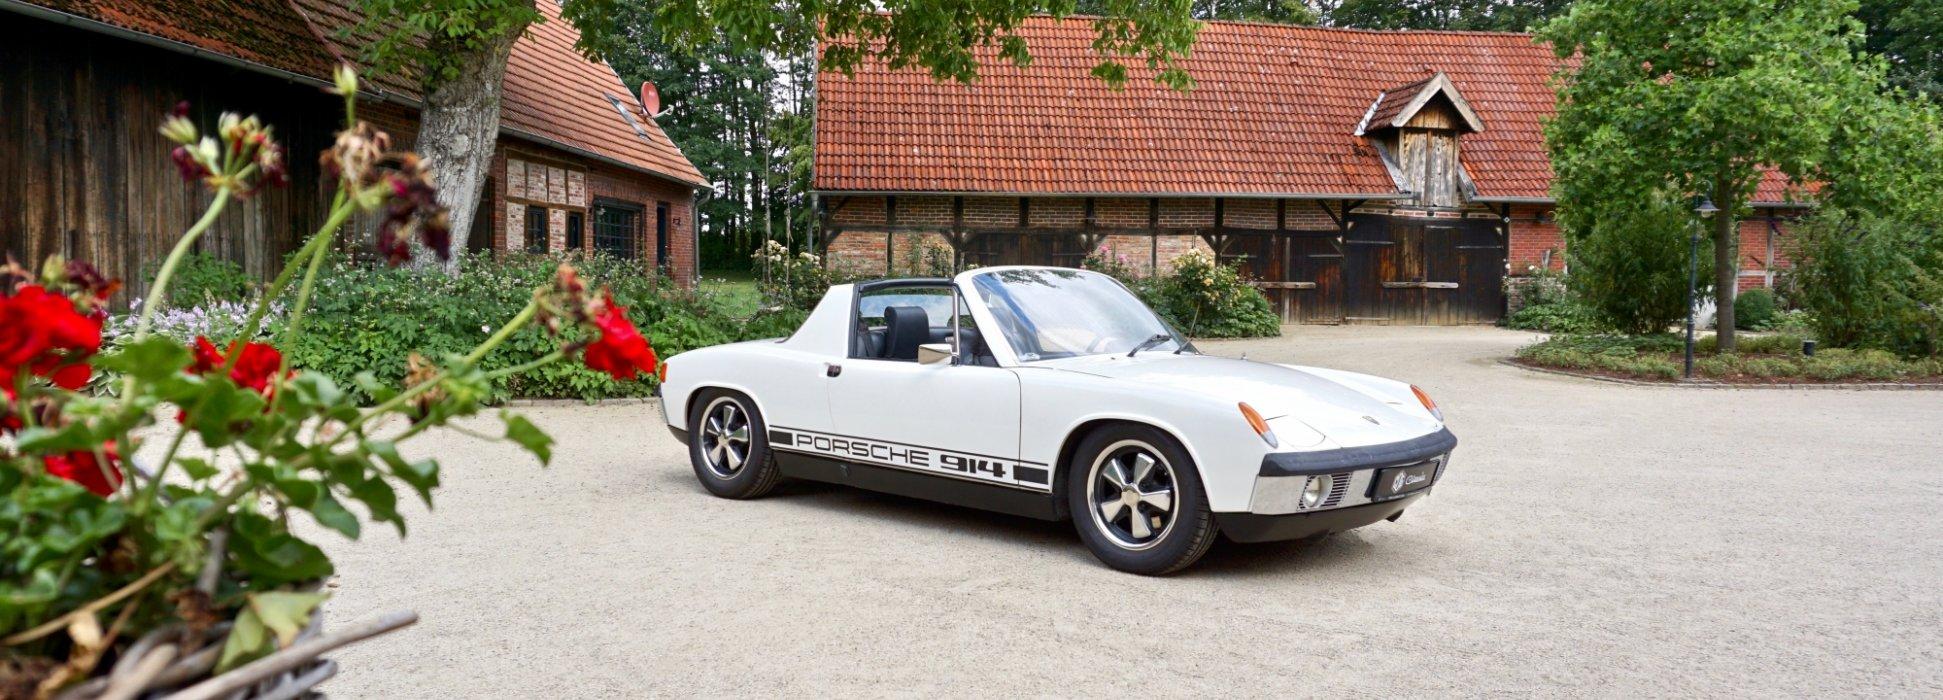 VW-Porsche 914 2.0 / 47 3